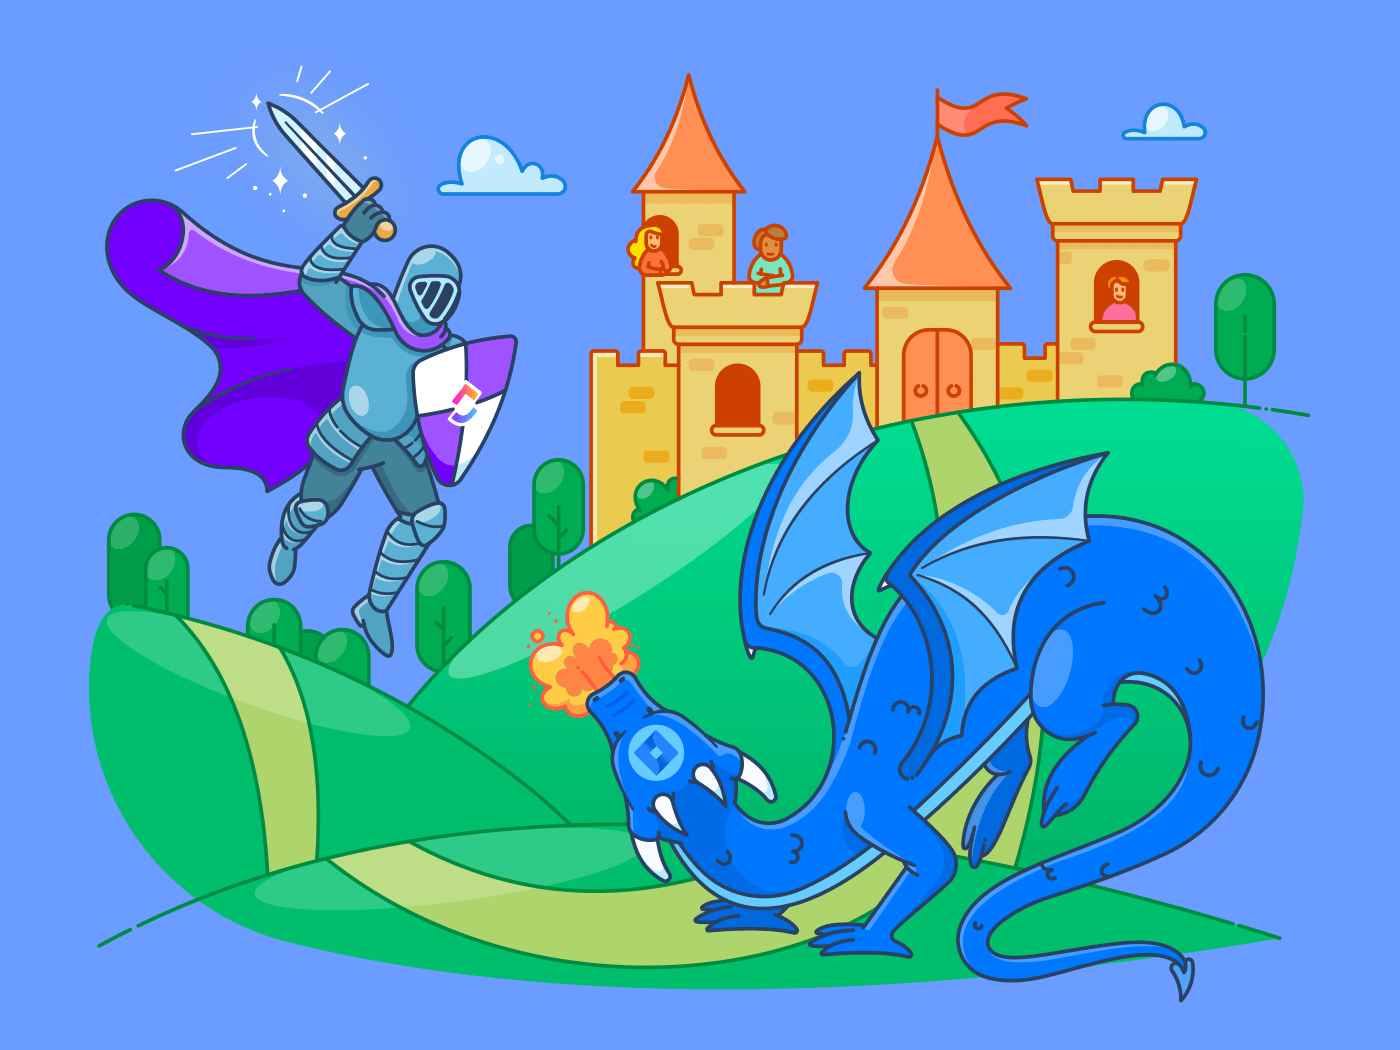 clickup knight fighting jira dragon